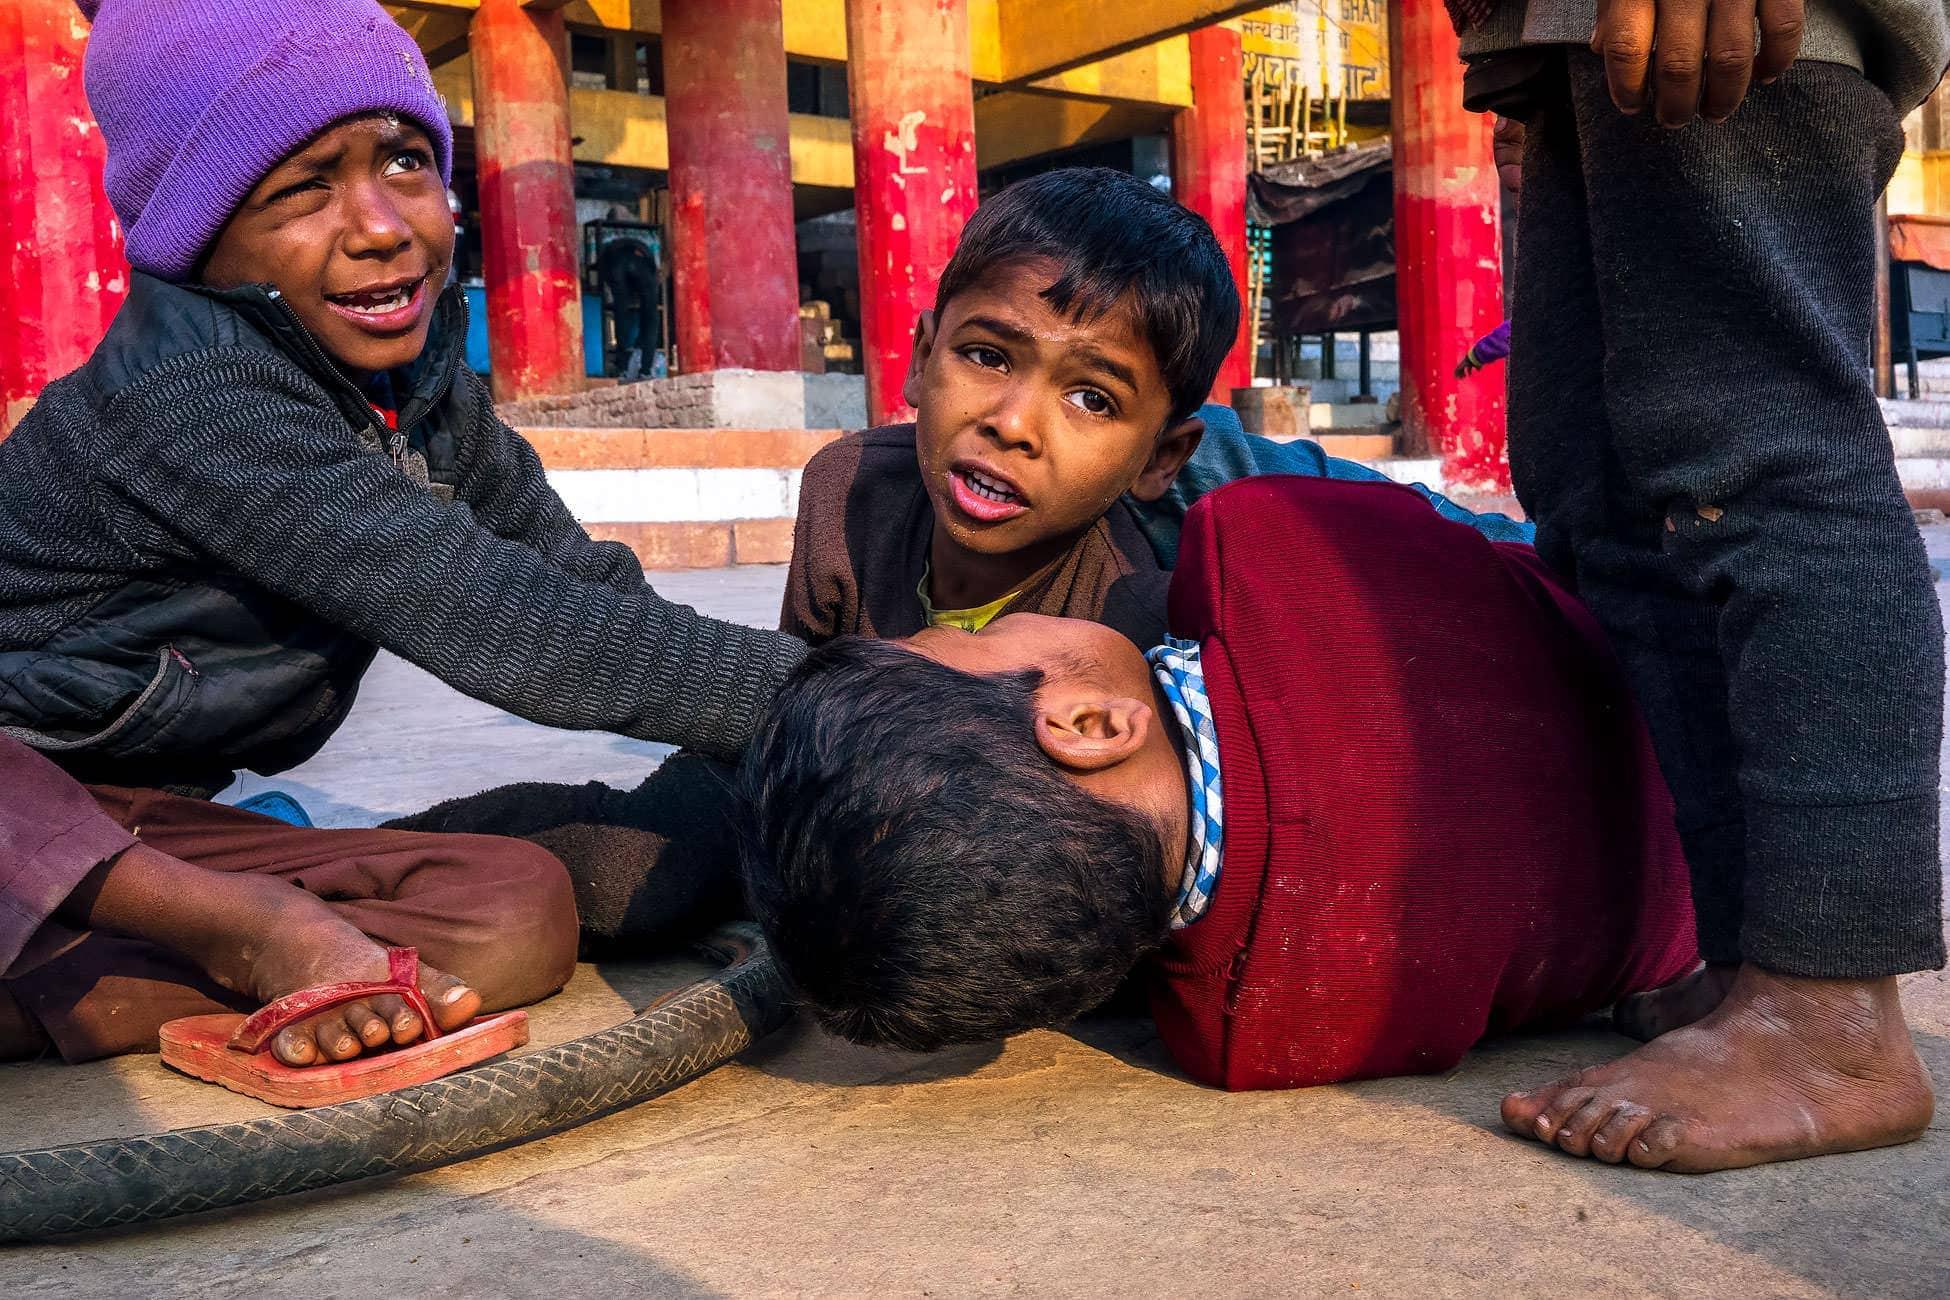 India street photography